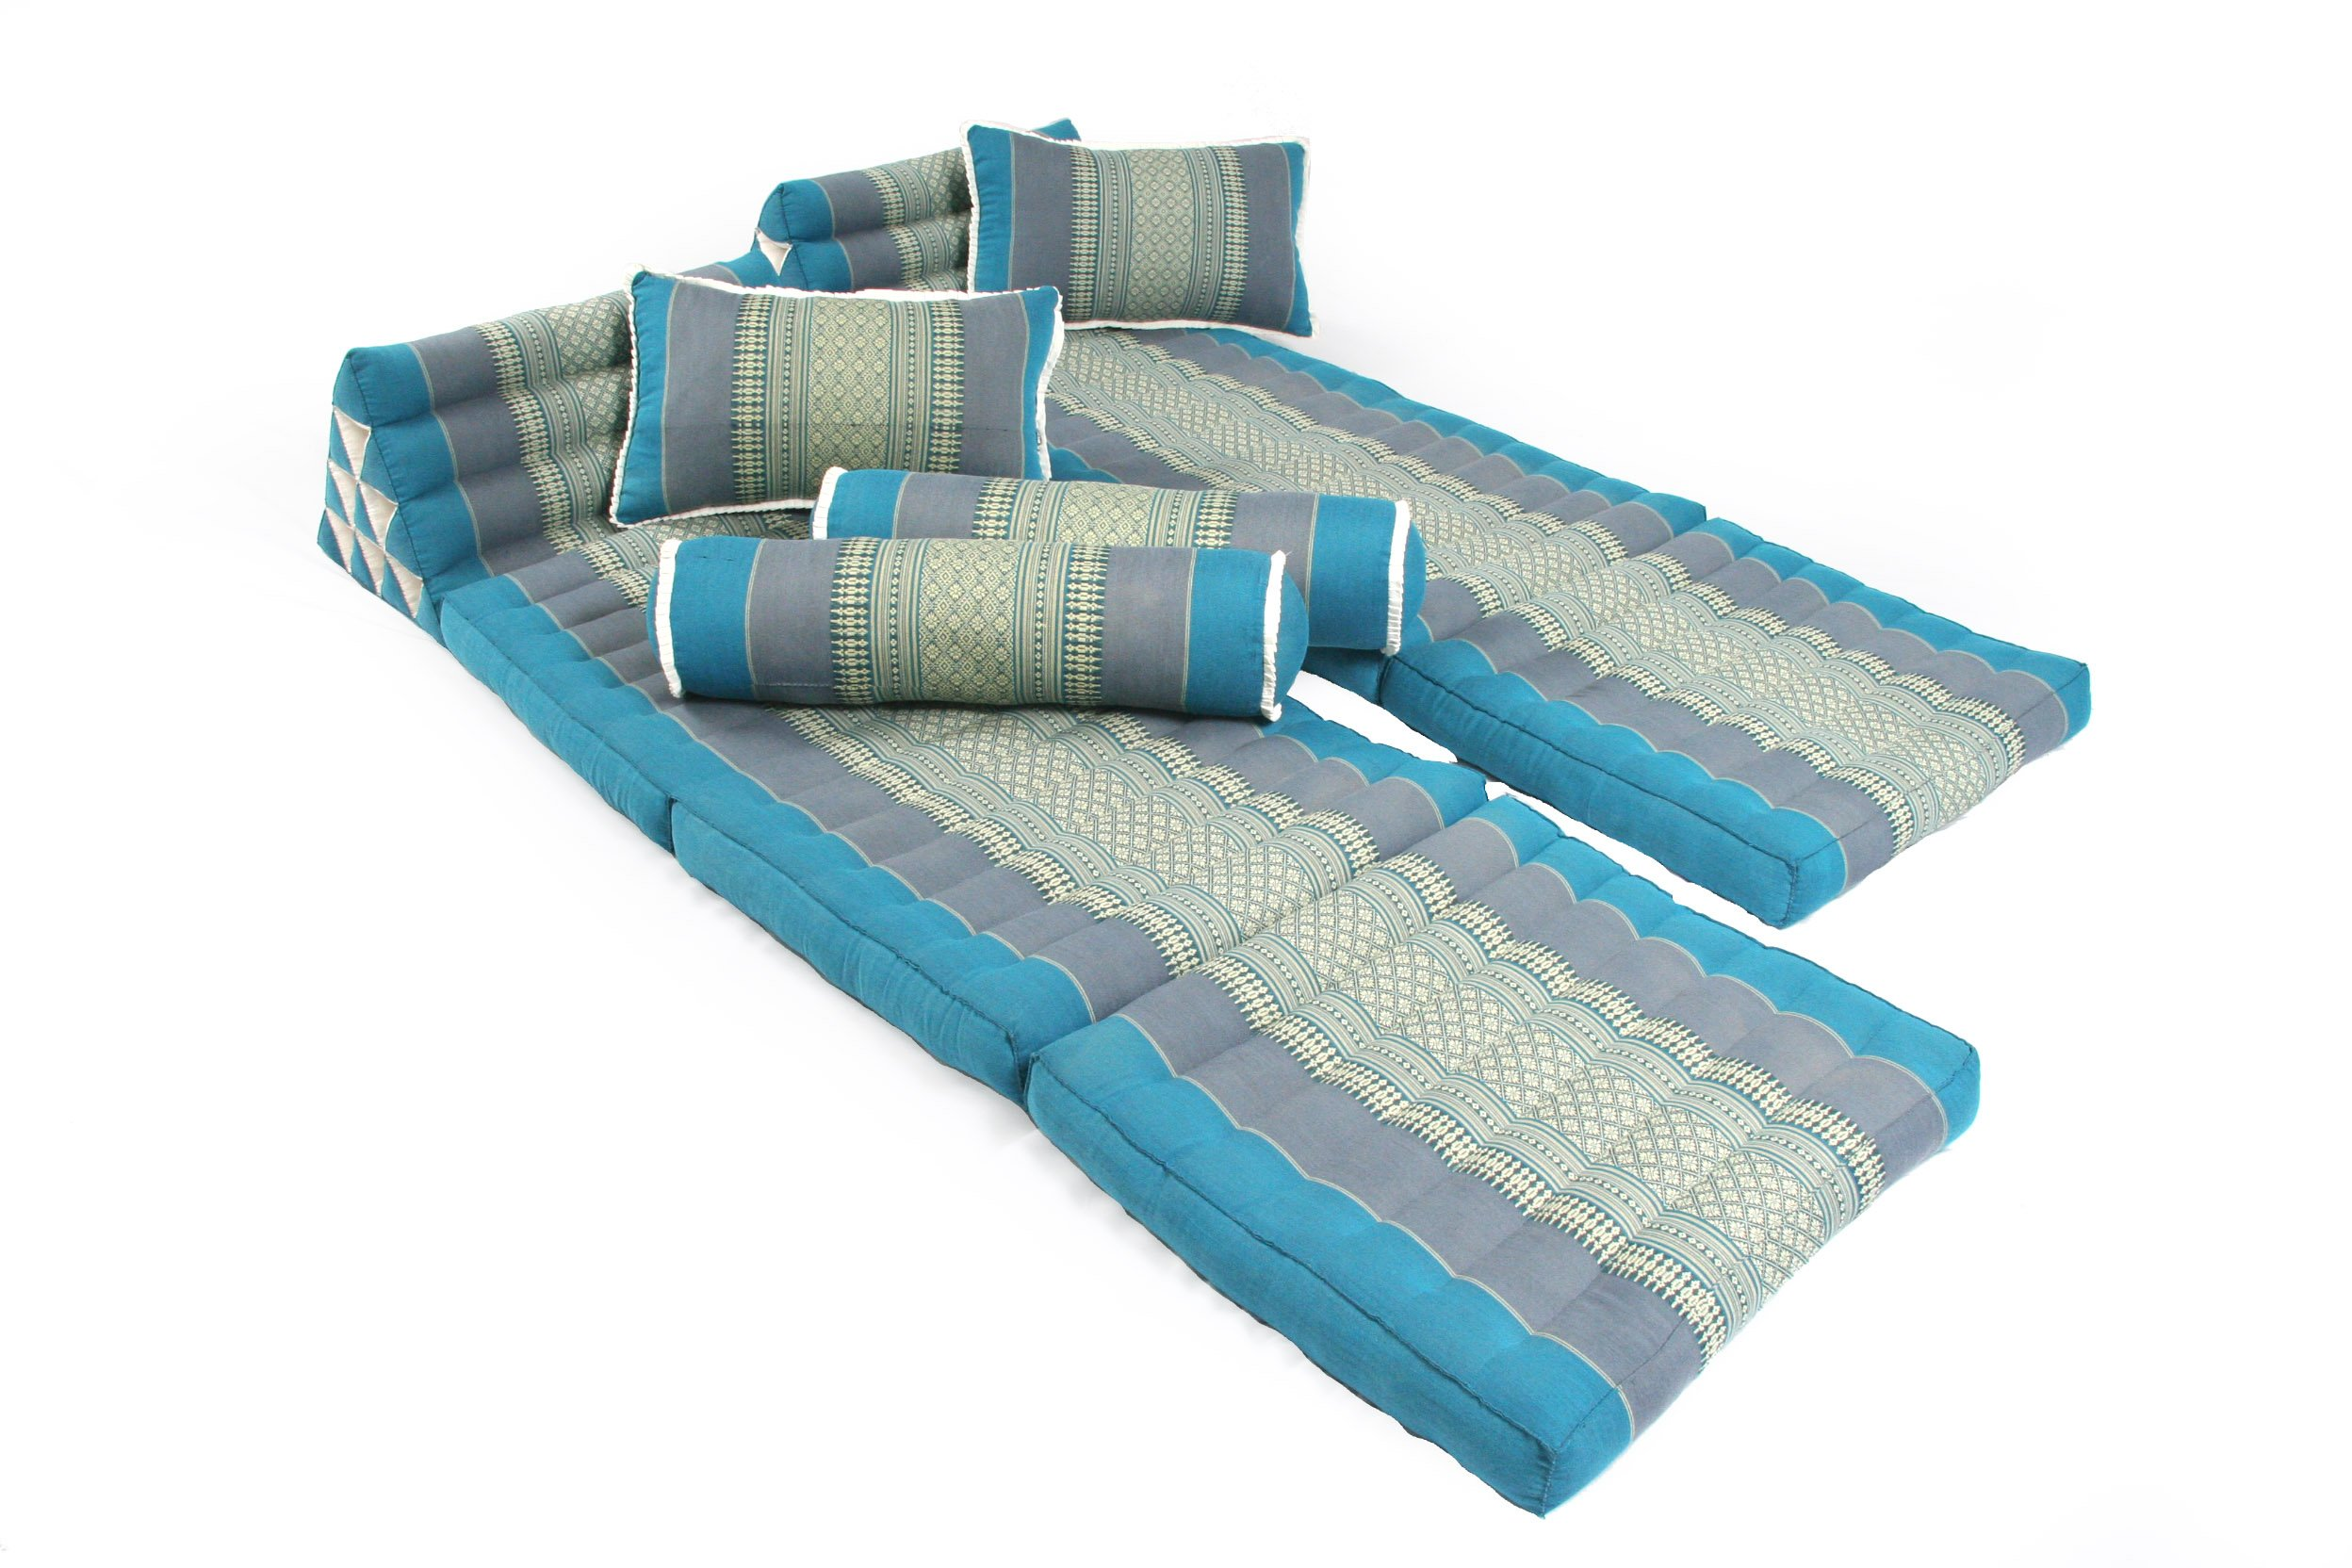 Sunshine Set (2x foldable Thai Mat + 2 Thaipillows + 2 Bolsters), Thai Fabric SkyBlues, 100% Kapok filling! by Handelsturm